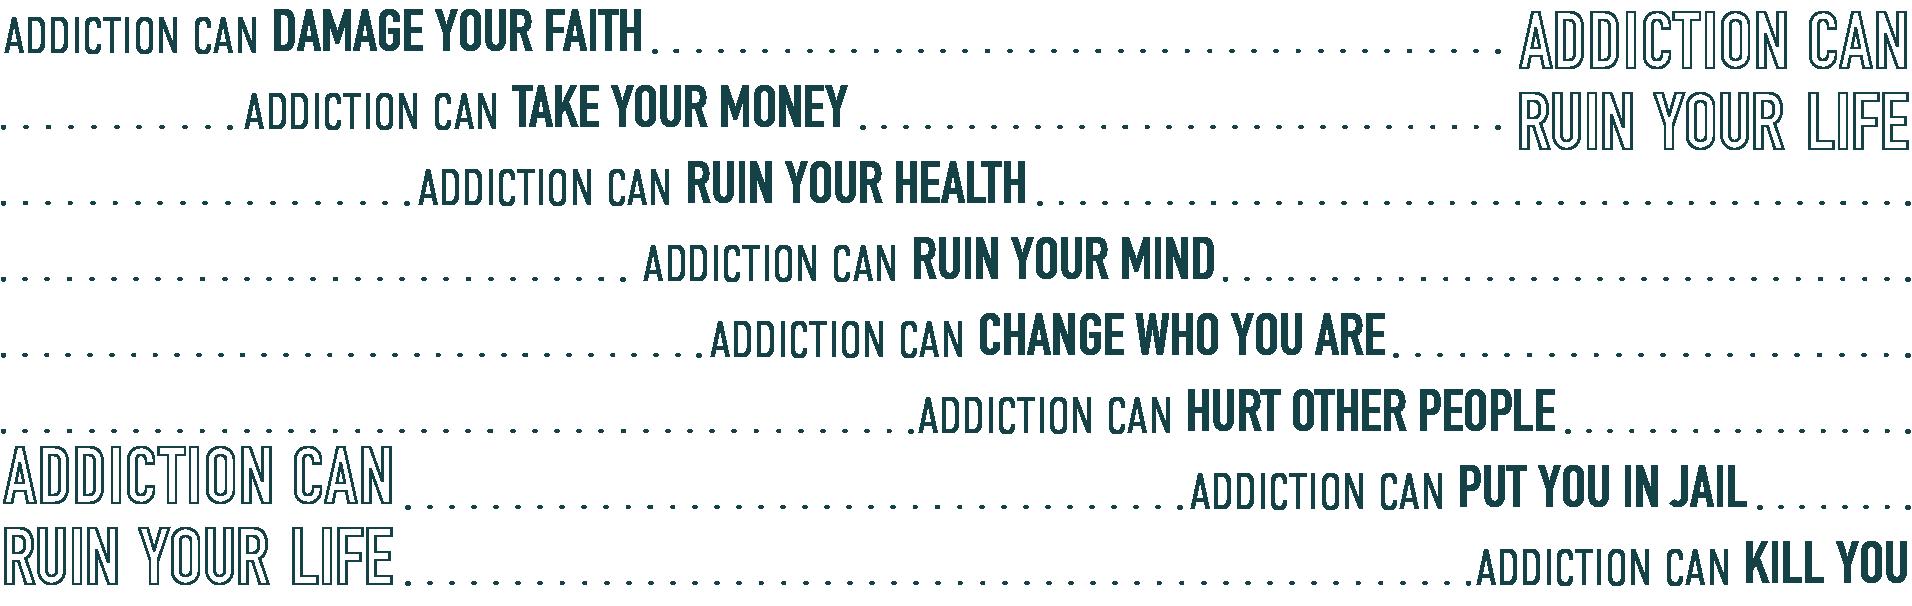 Addiction Ruins Lives